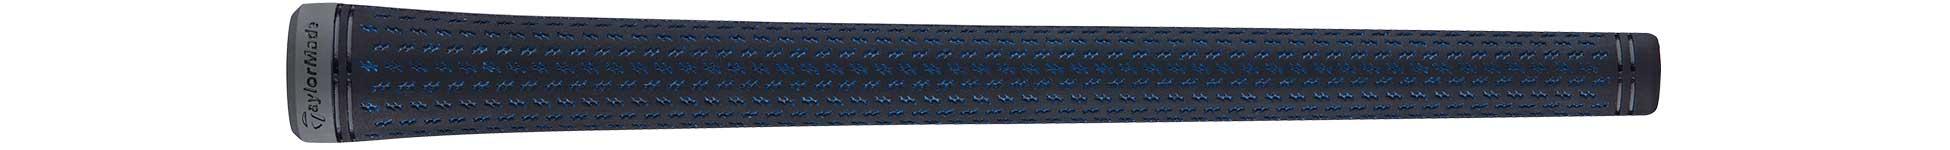 Crossline Black/Blue GEC